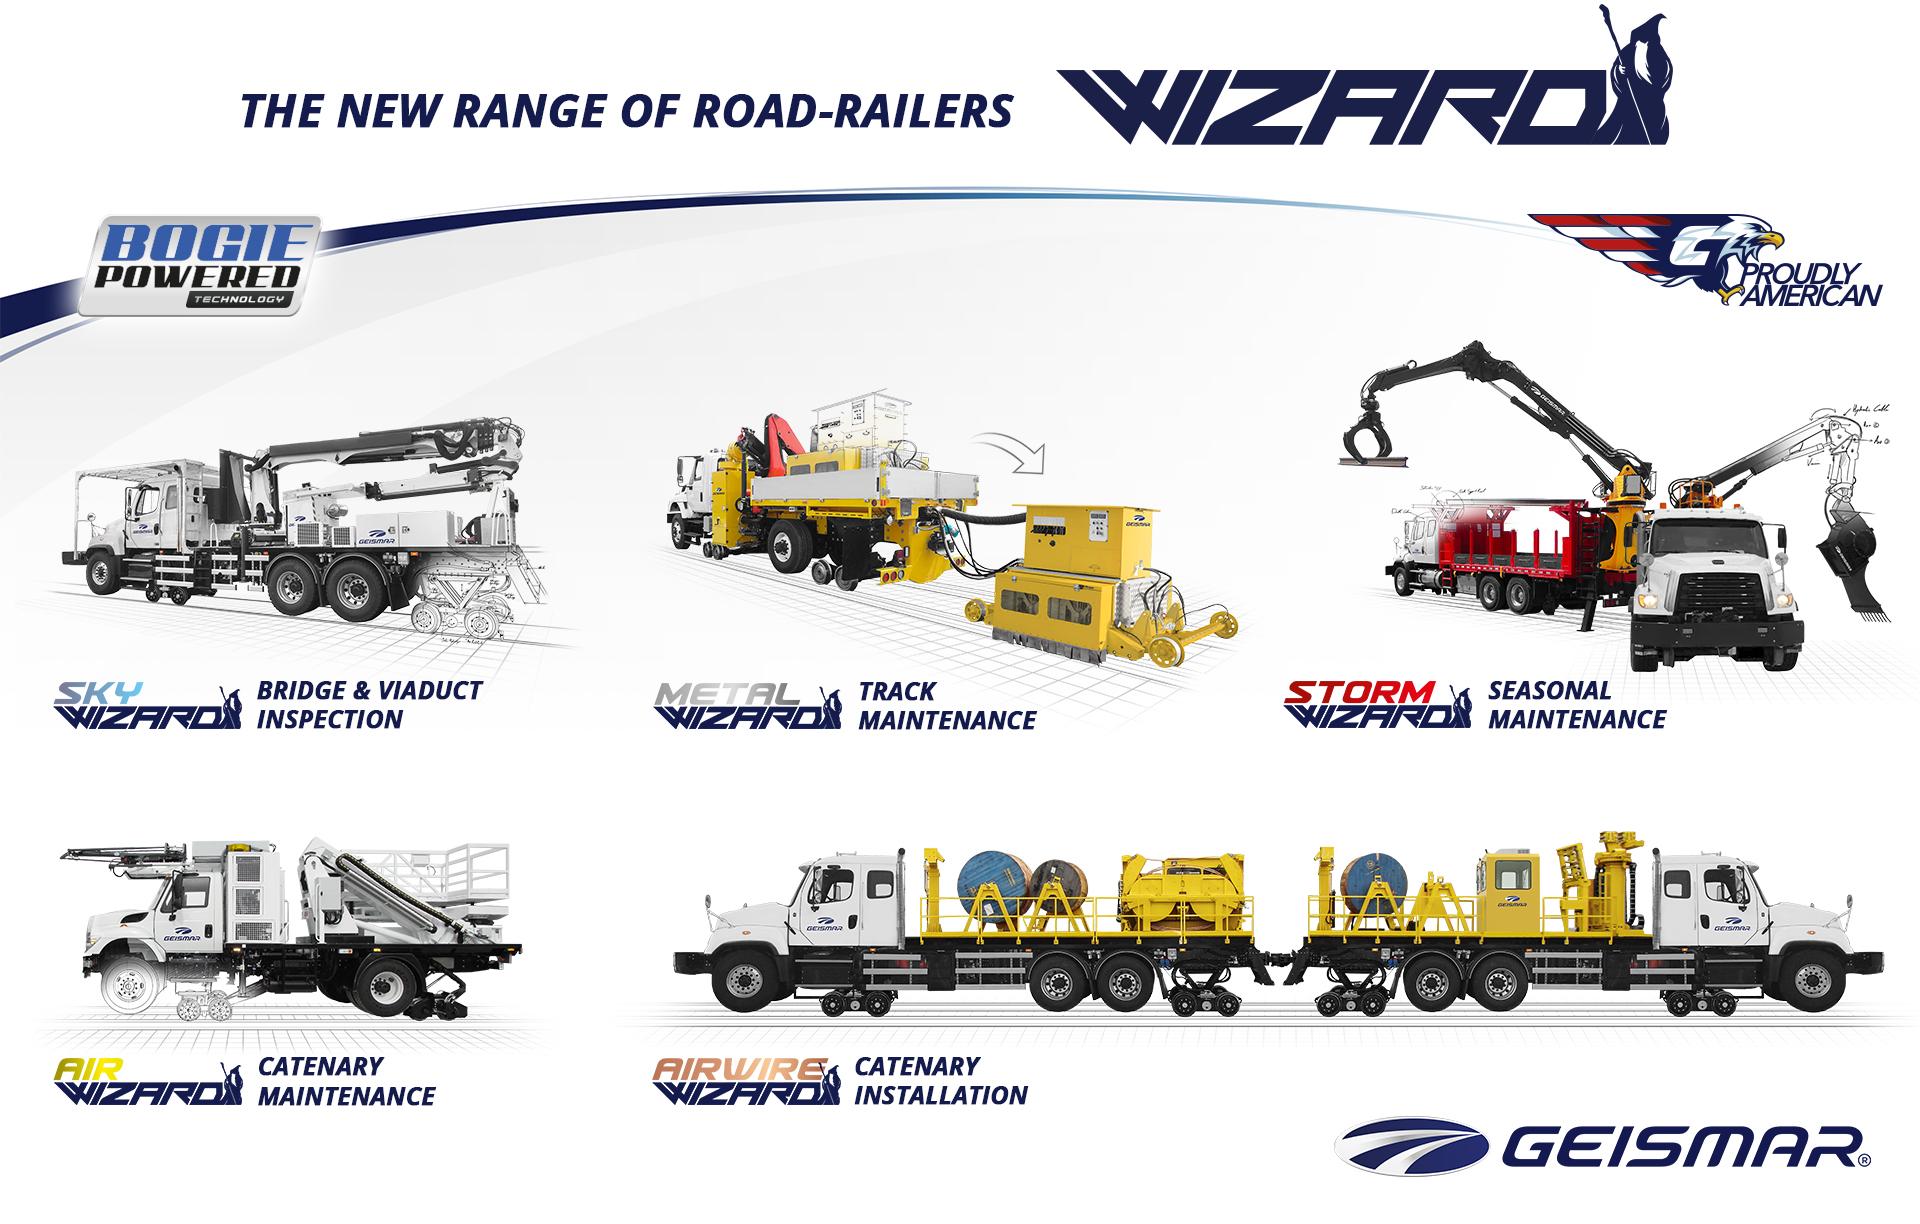 Infographic Wizard road-railers range